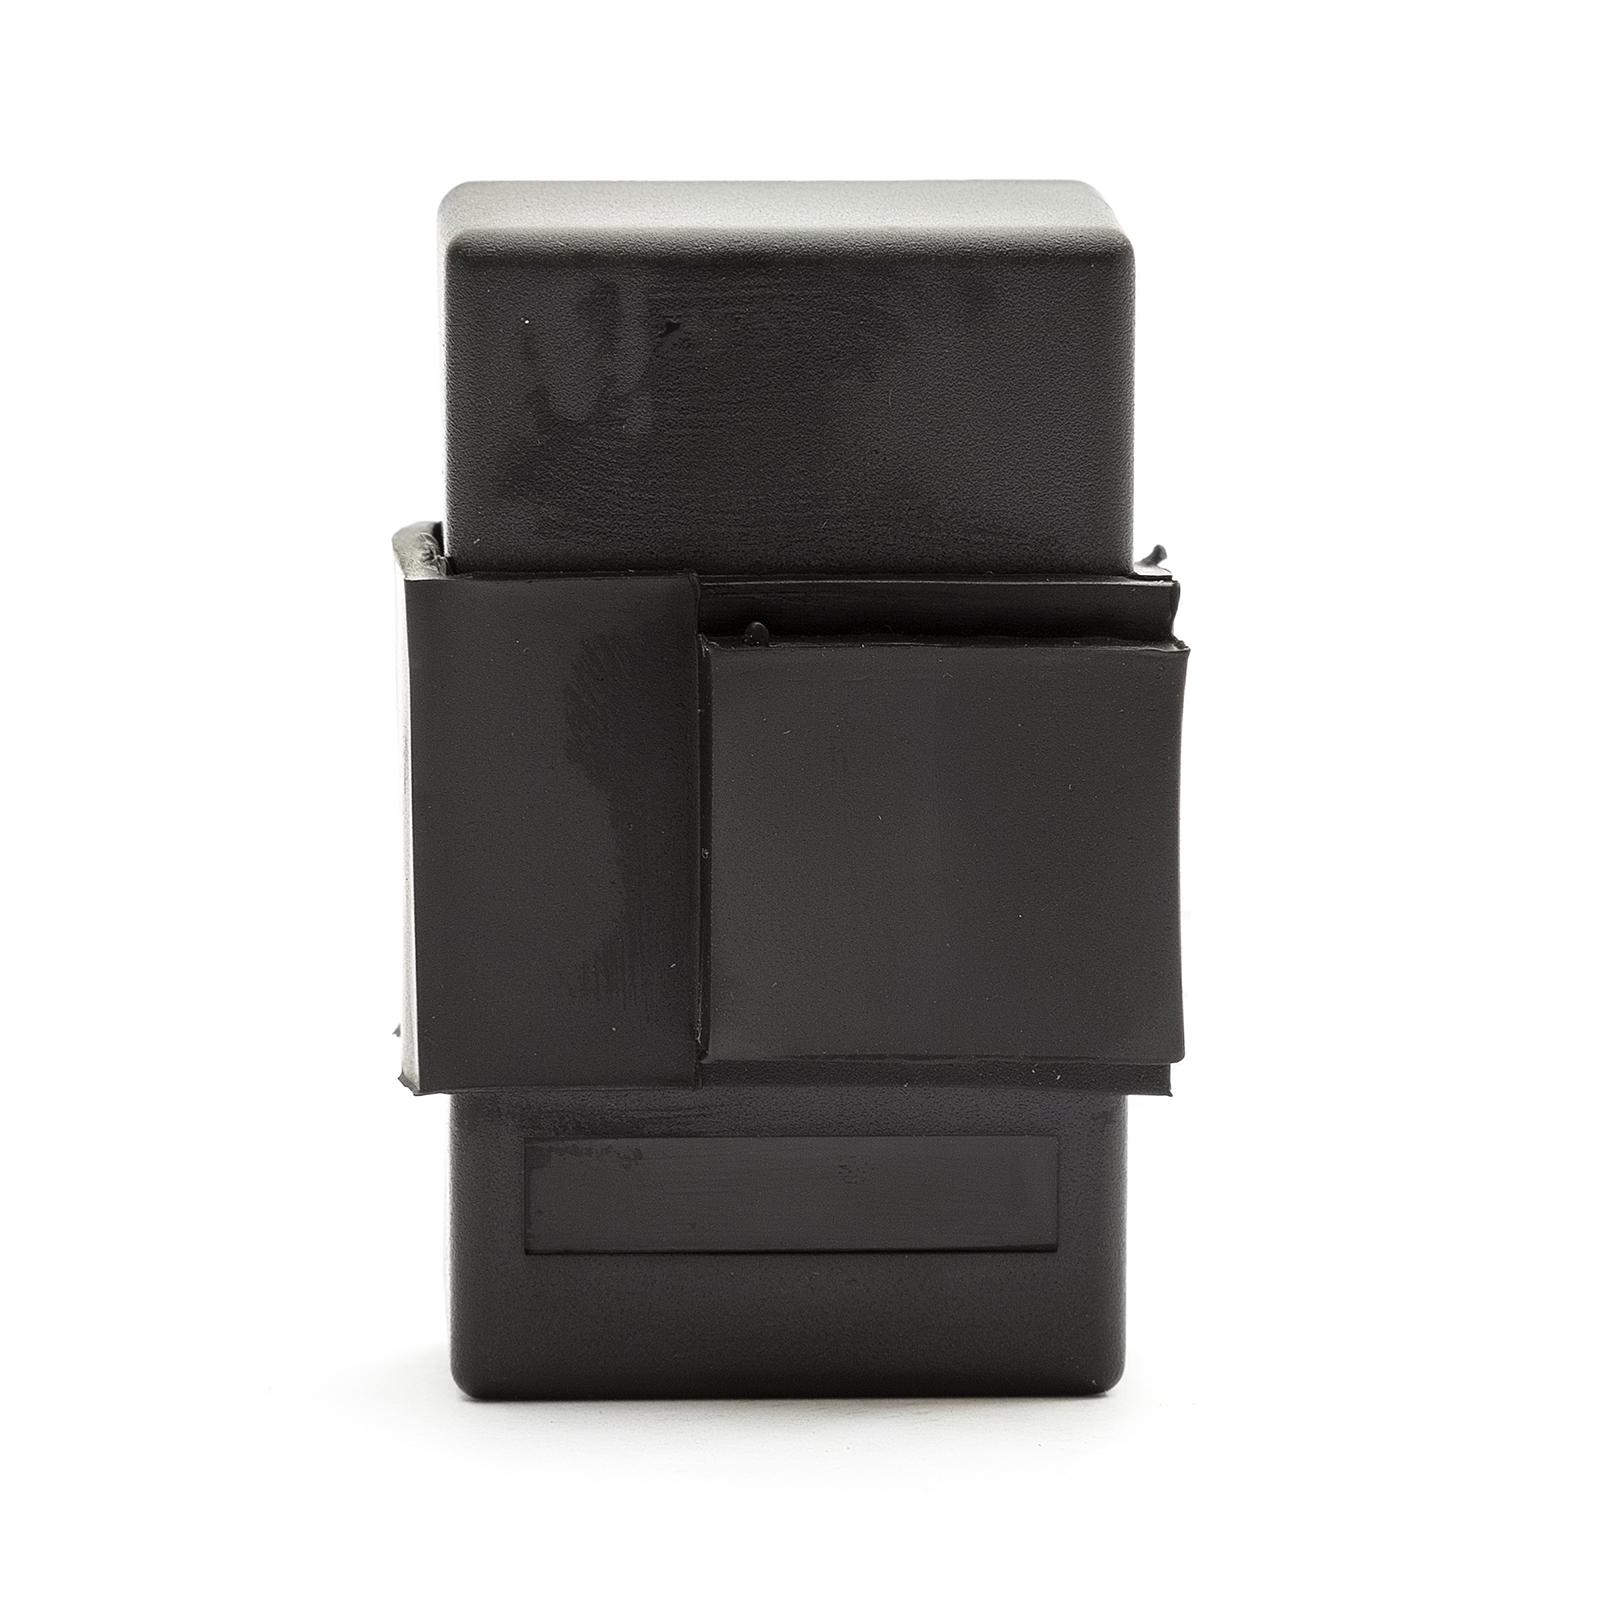 50cc 70cc 90cc loncin lifan quad bike cdi fits chinese. Black Bedroom Furniture Sets. Home Design Ideas